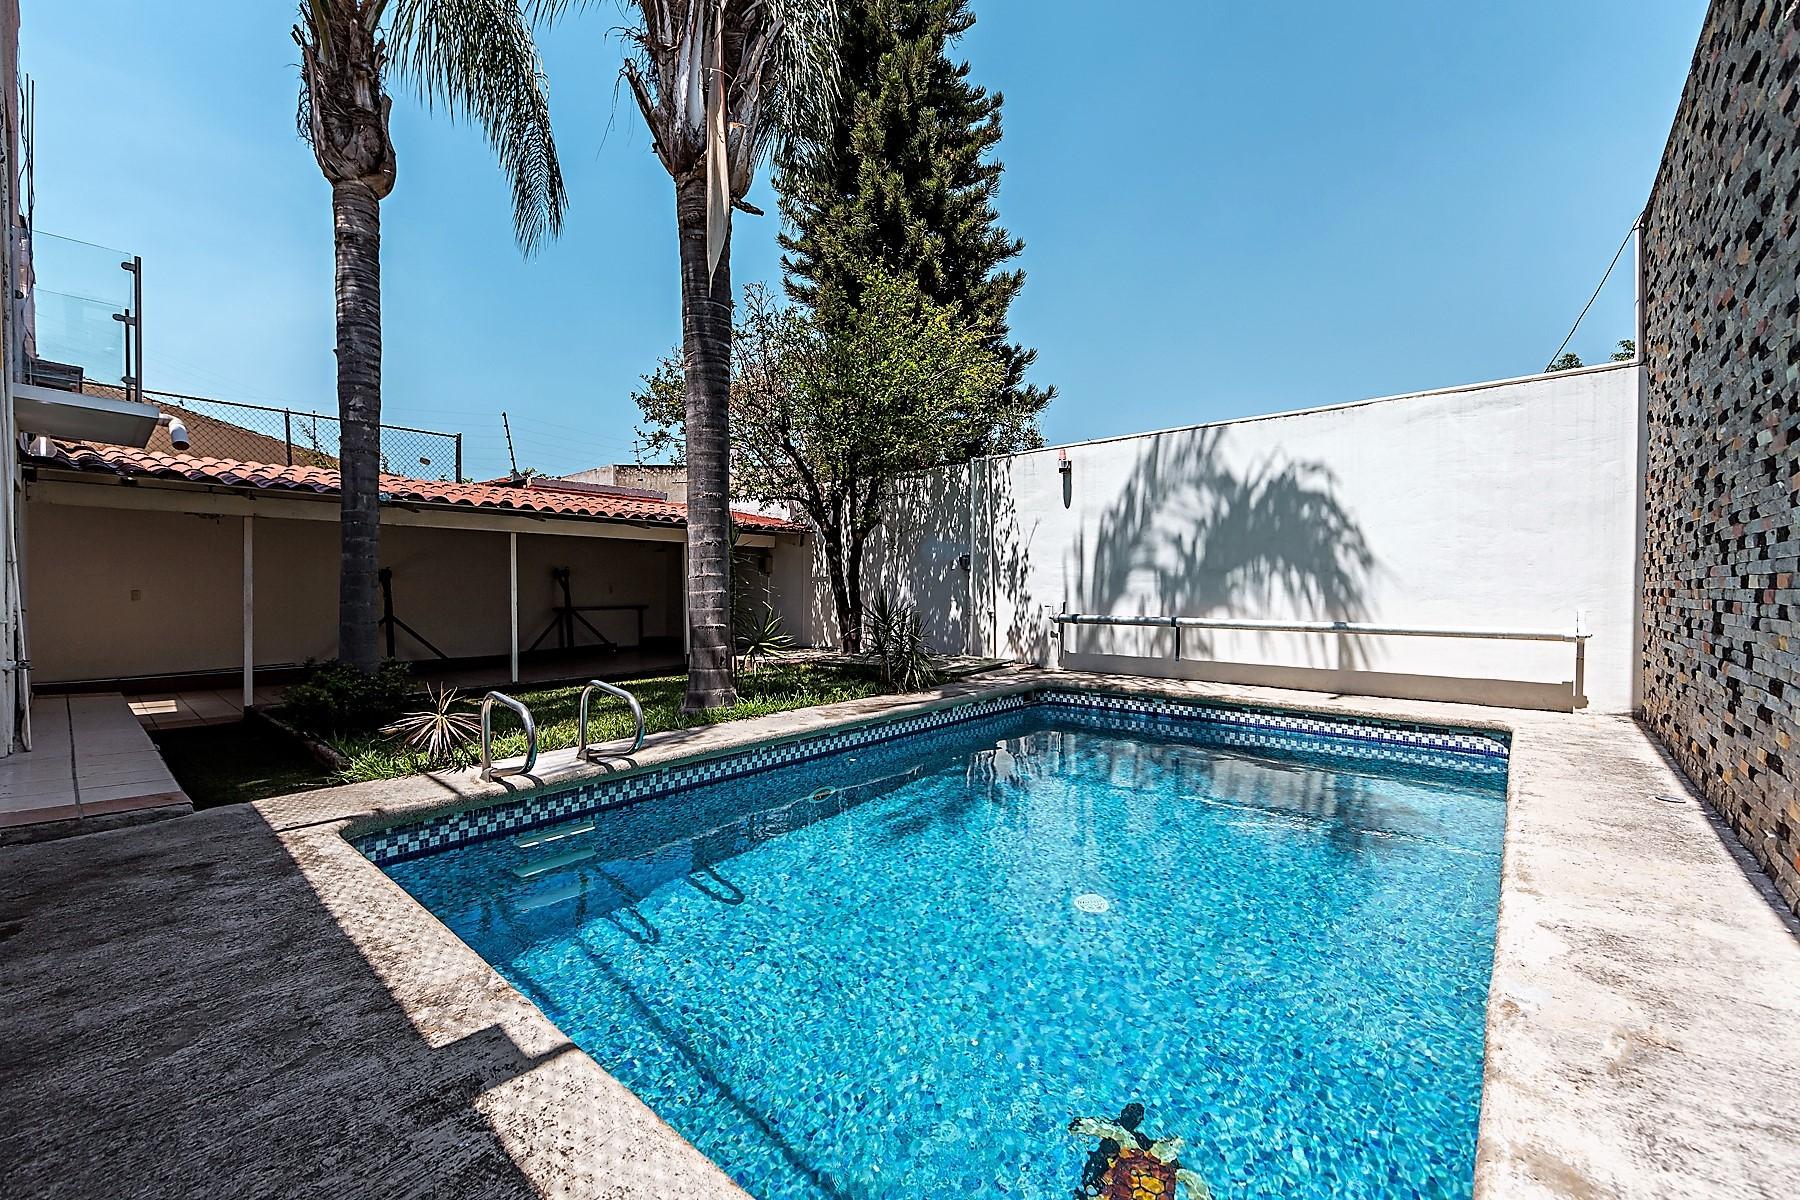 Single Family Homes for Sale at Casa Jardines del Country at Guadalajara. Fidel Velázquez Sánchez 1938 Guadalajara, Jalisco 44210 Mexico